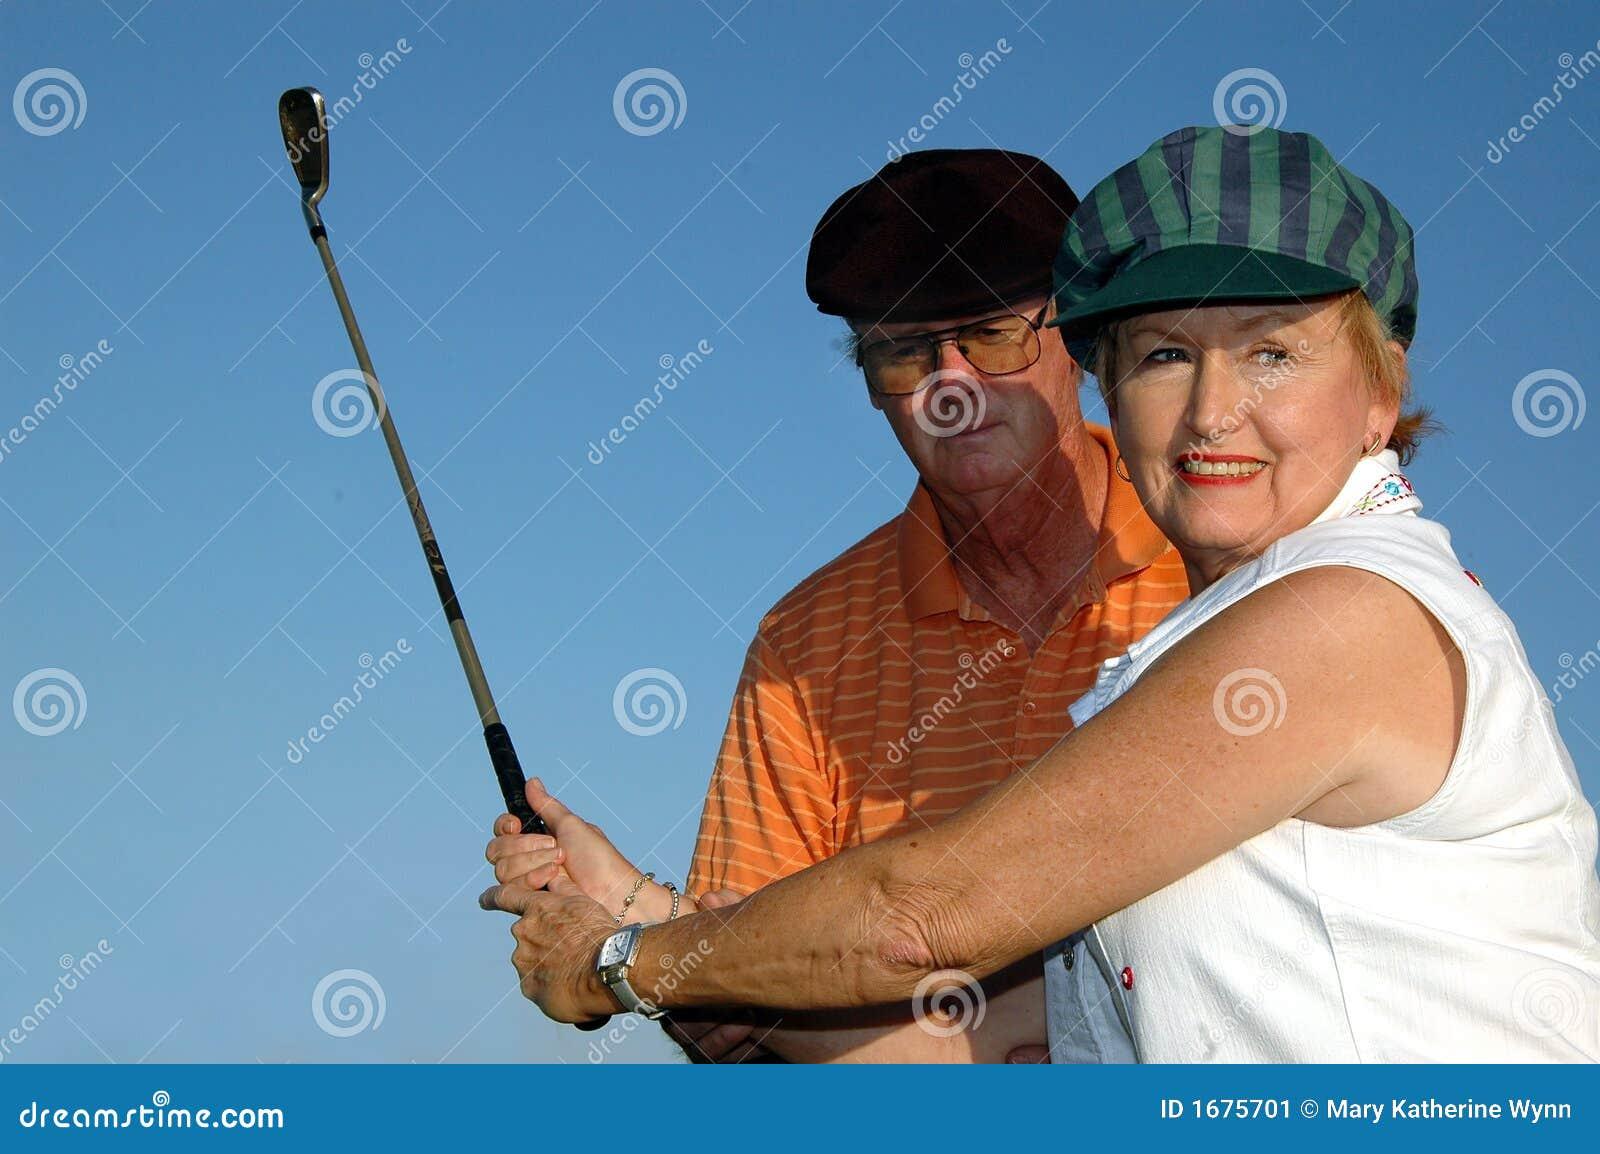 Golf lesson close-up